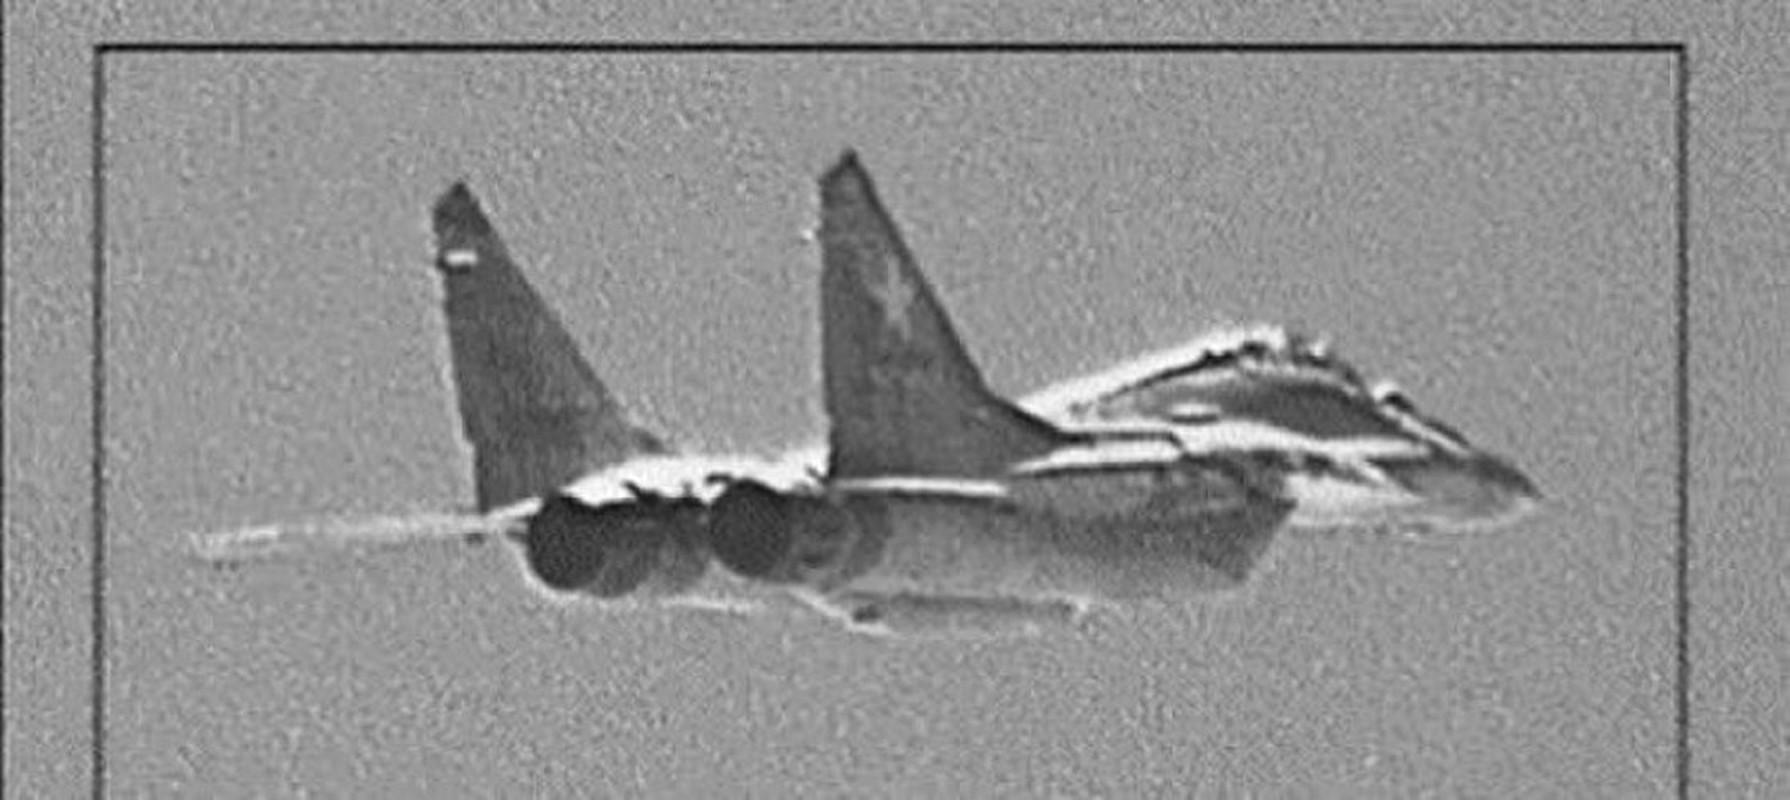 May bay nem bom T-22 Nga xuat hien o Libya khien My kinh ngac-Hinh-10